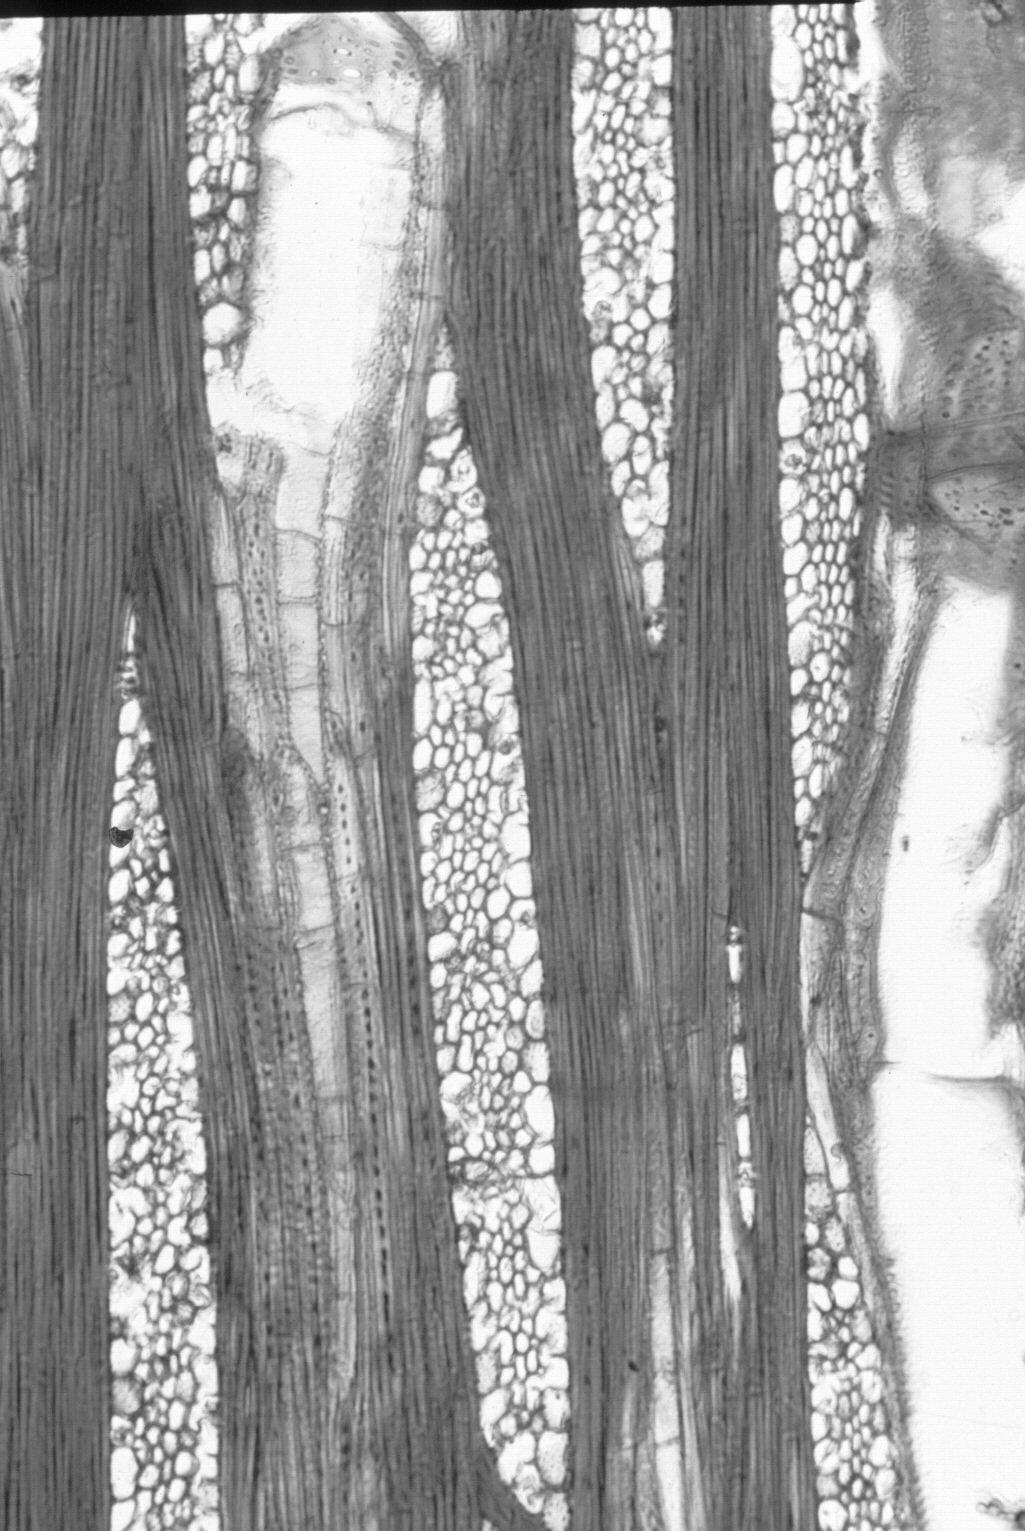 DIPTEROCARPACEAE Anisoptera marginata